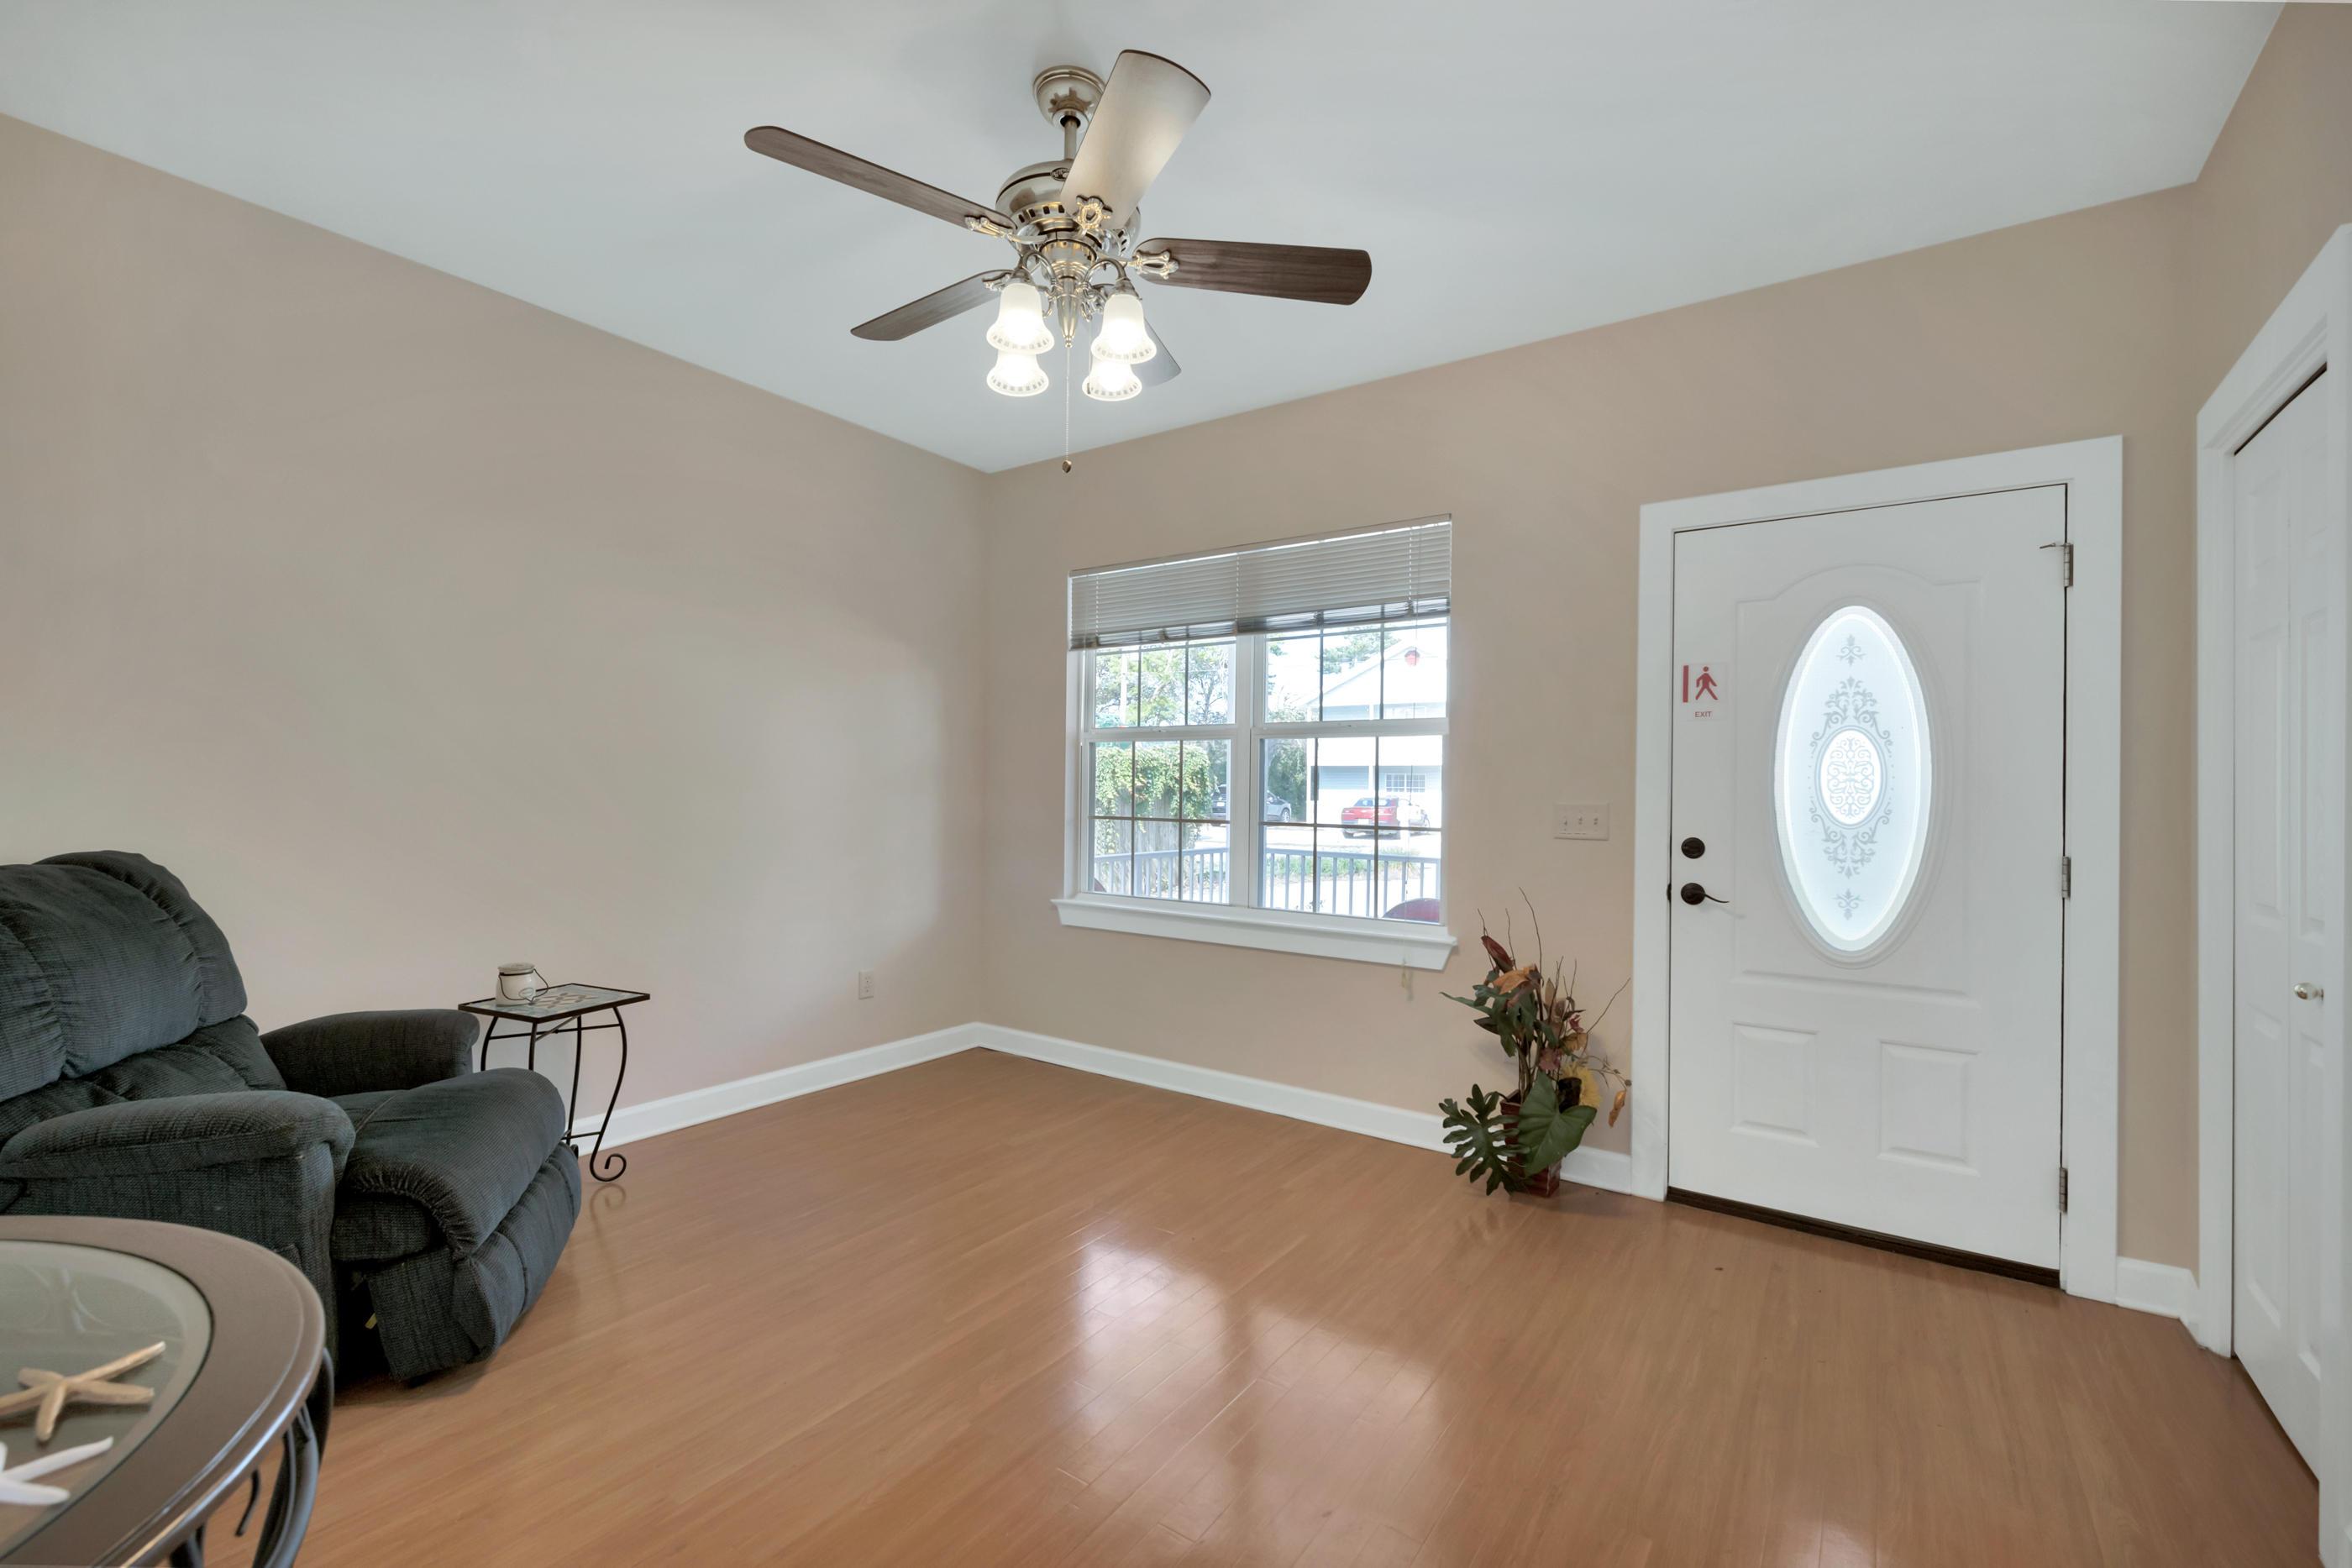 A 3 Bedroom 2 Bedroom Crystal Beach Home